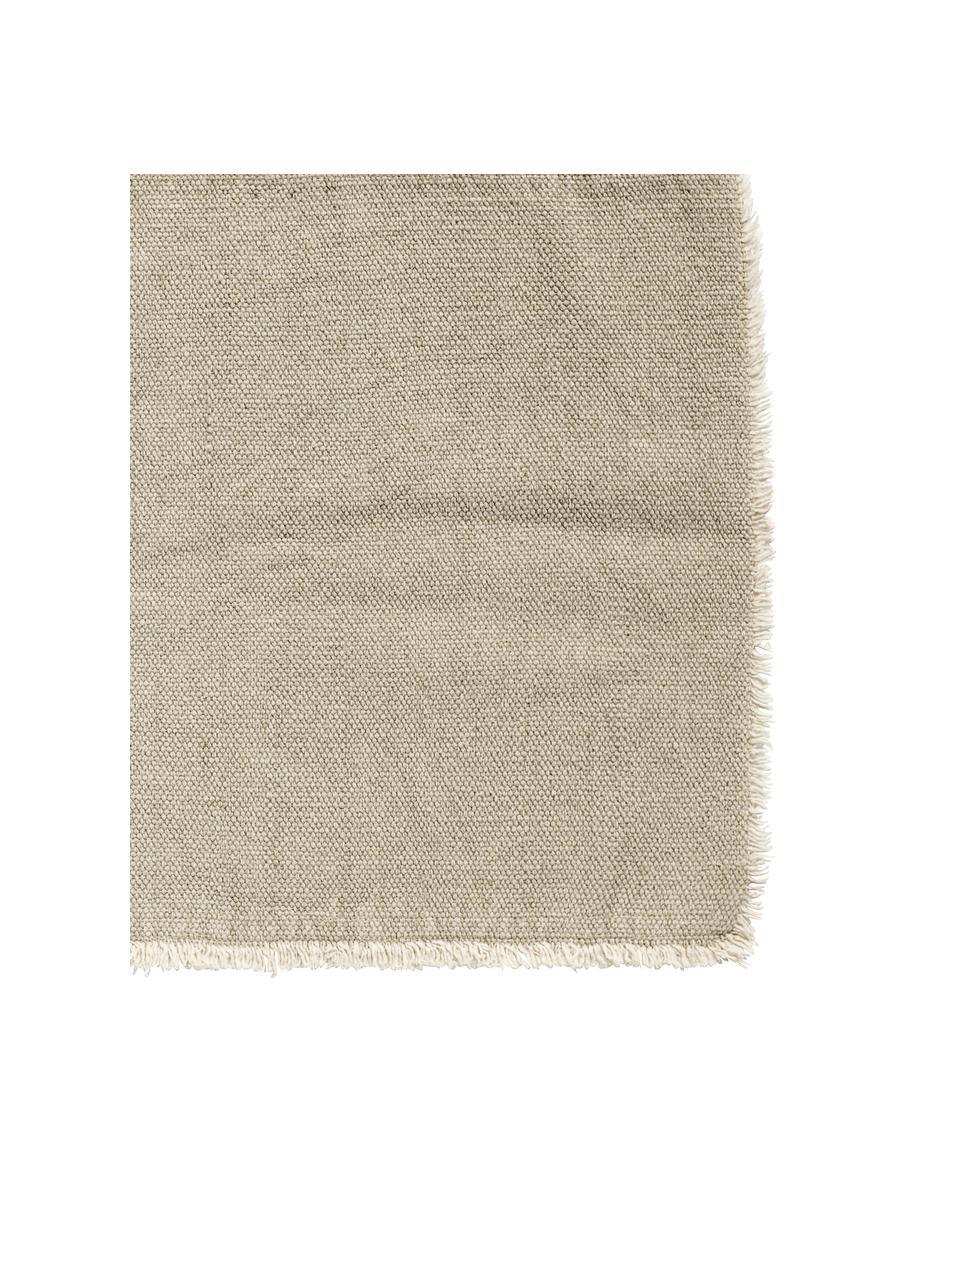 Placemats Edge, 6 stuks, Katoenmix, stonewashed, Greige, 35 x 48 cm